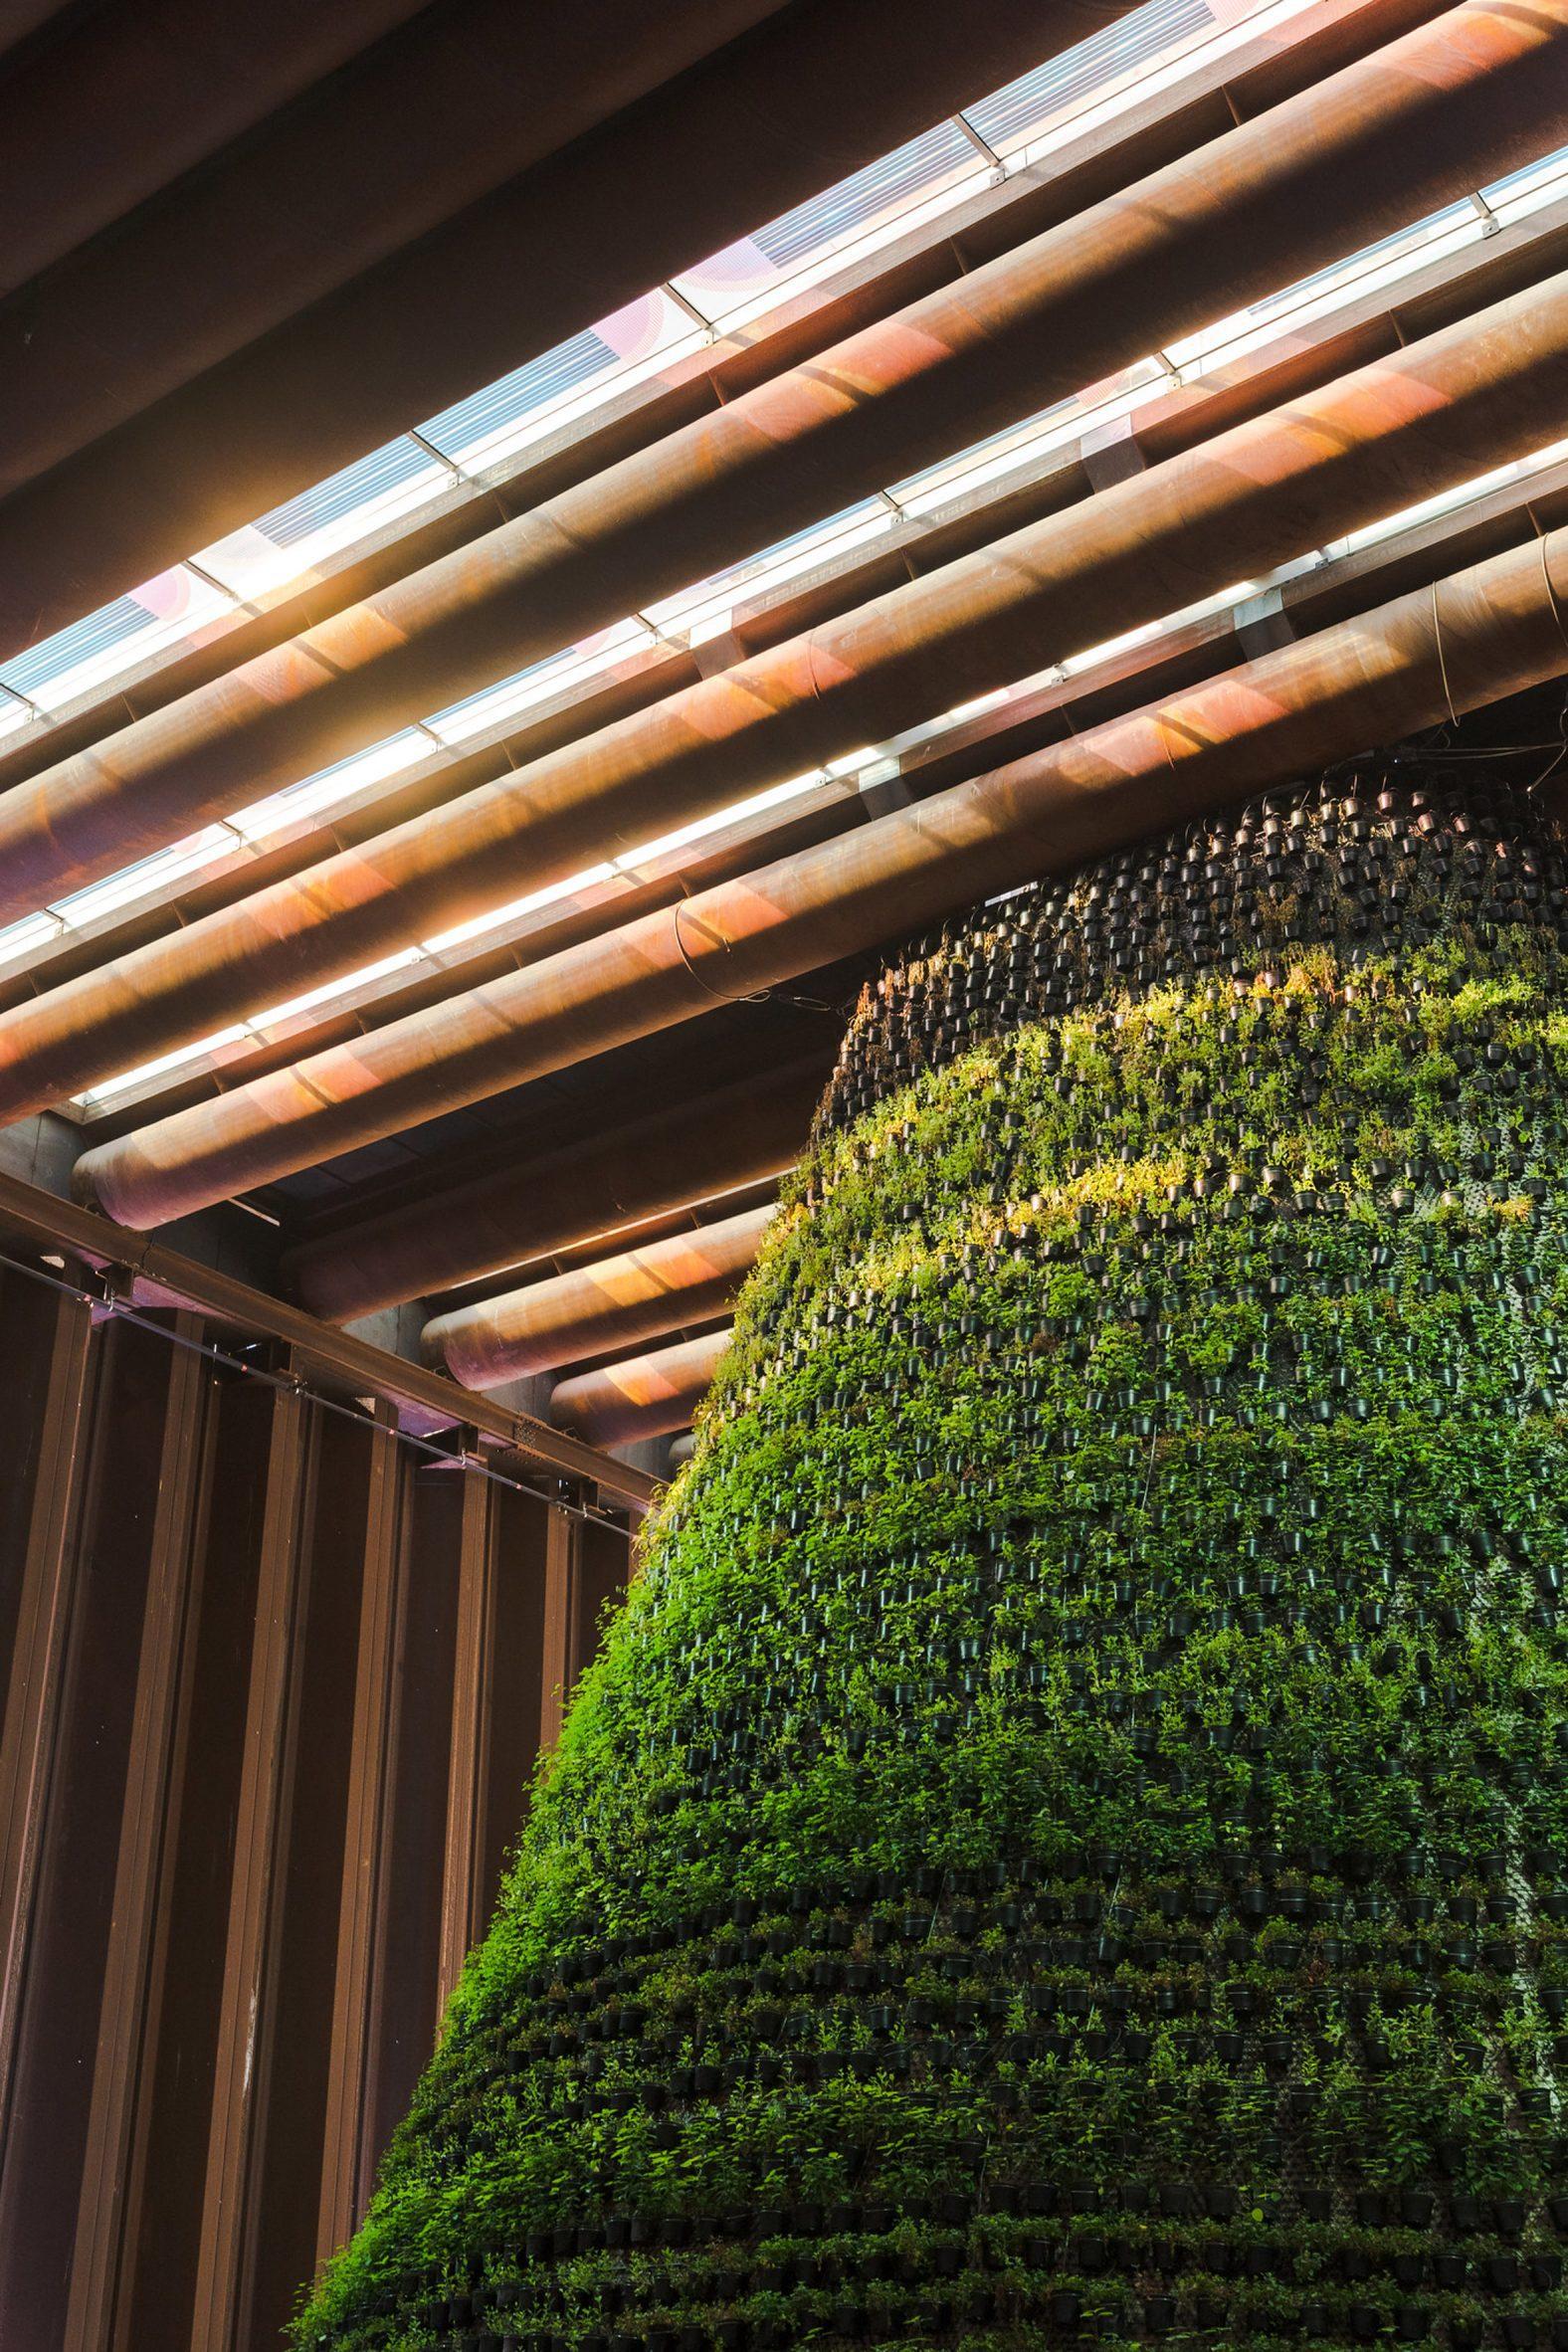 Sunlight falls through coloured solar panel skylight into the Dutch pavilion at Expo 2020 Dubai